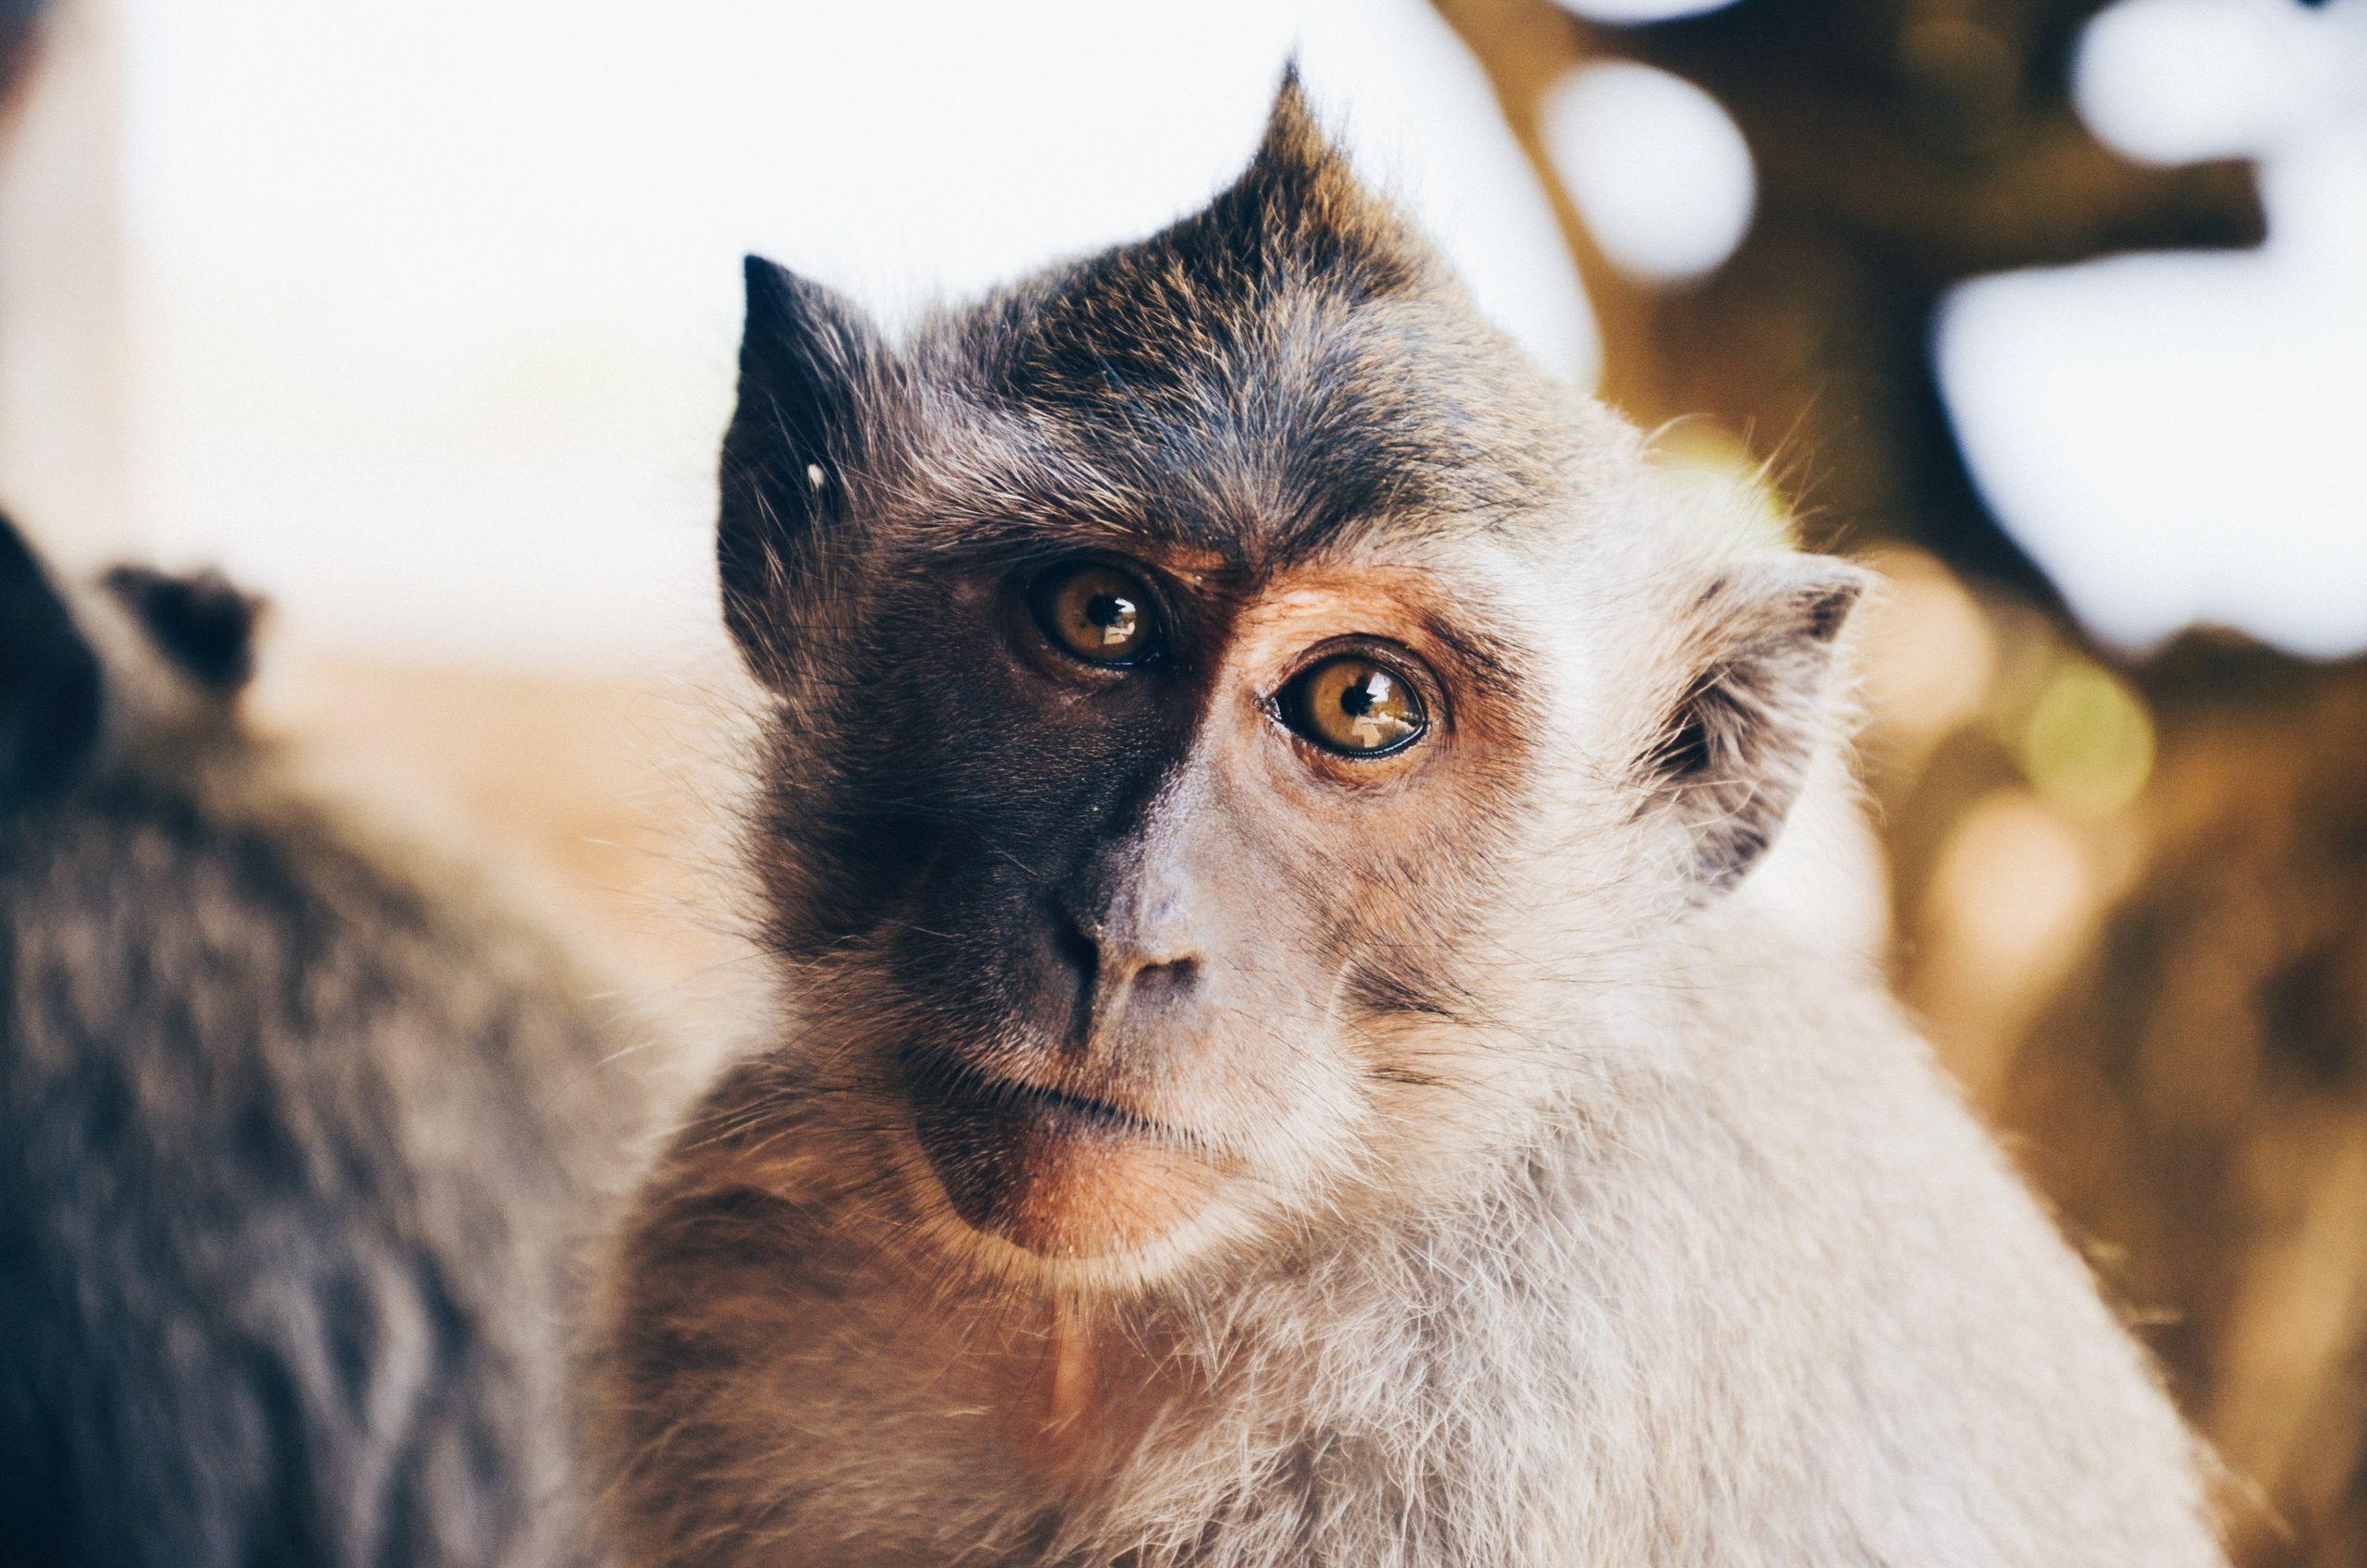 experimenting on monkeys